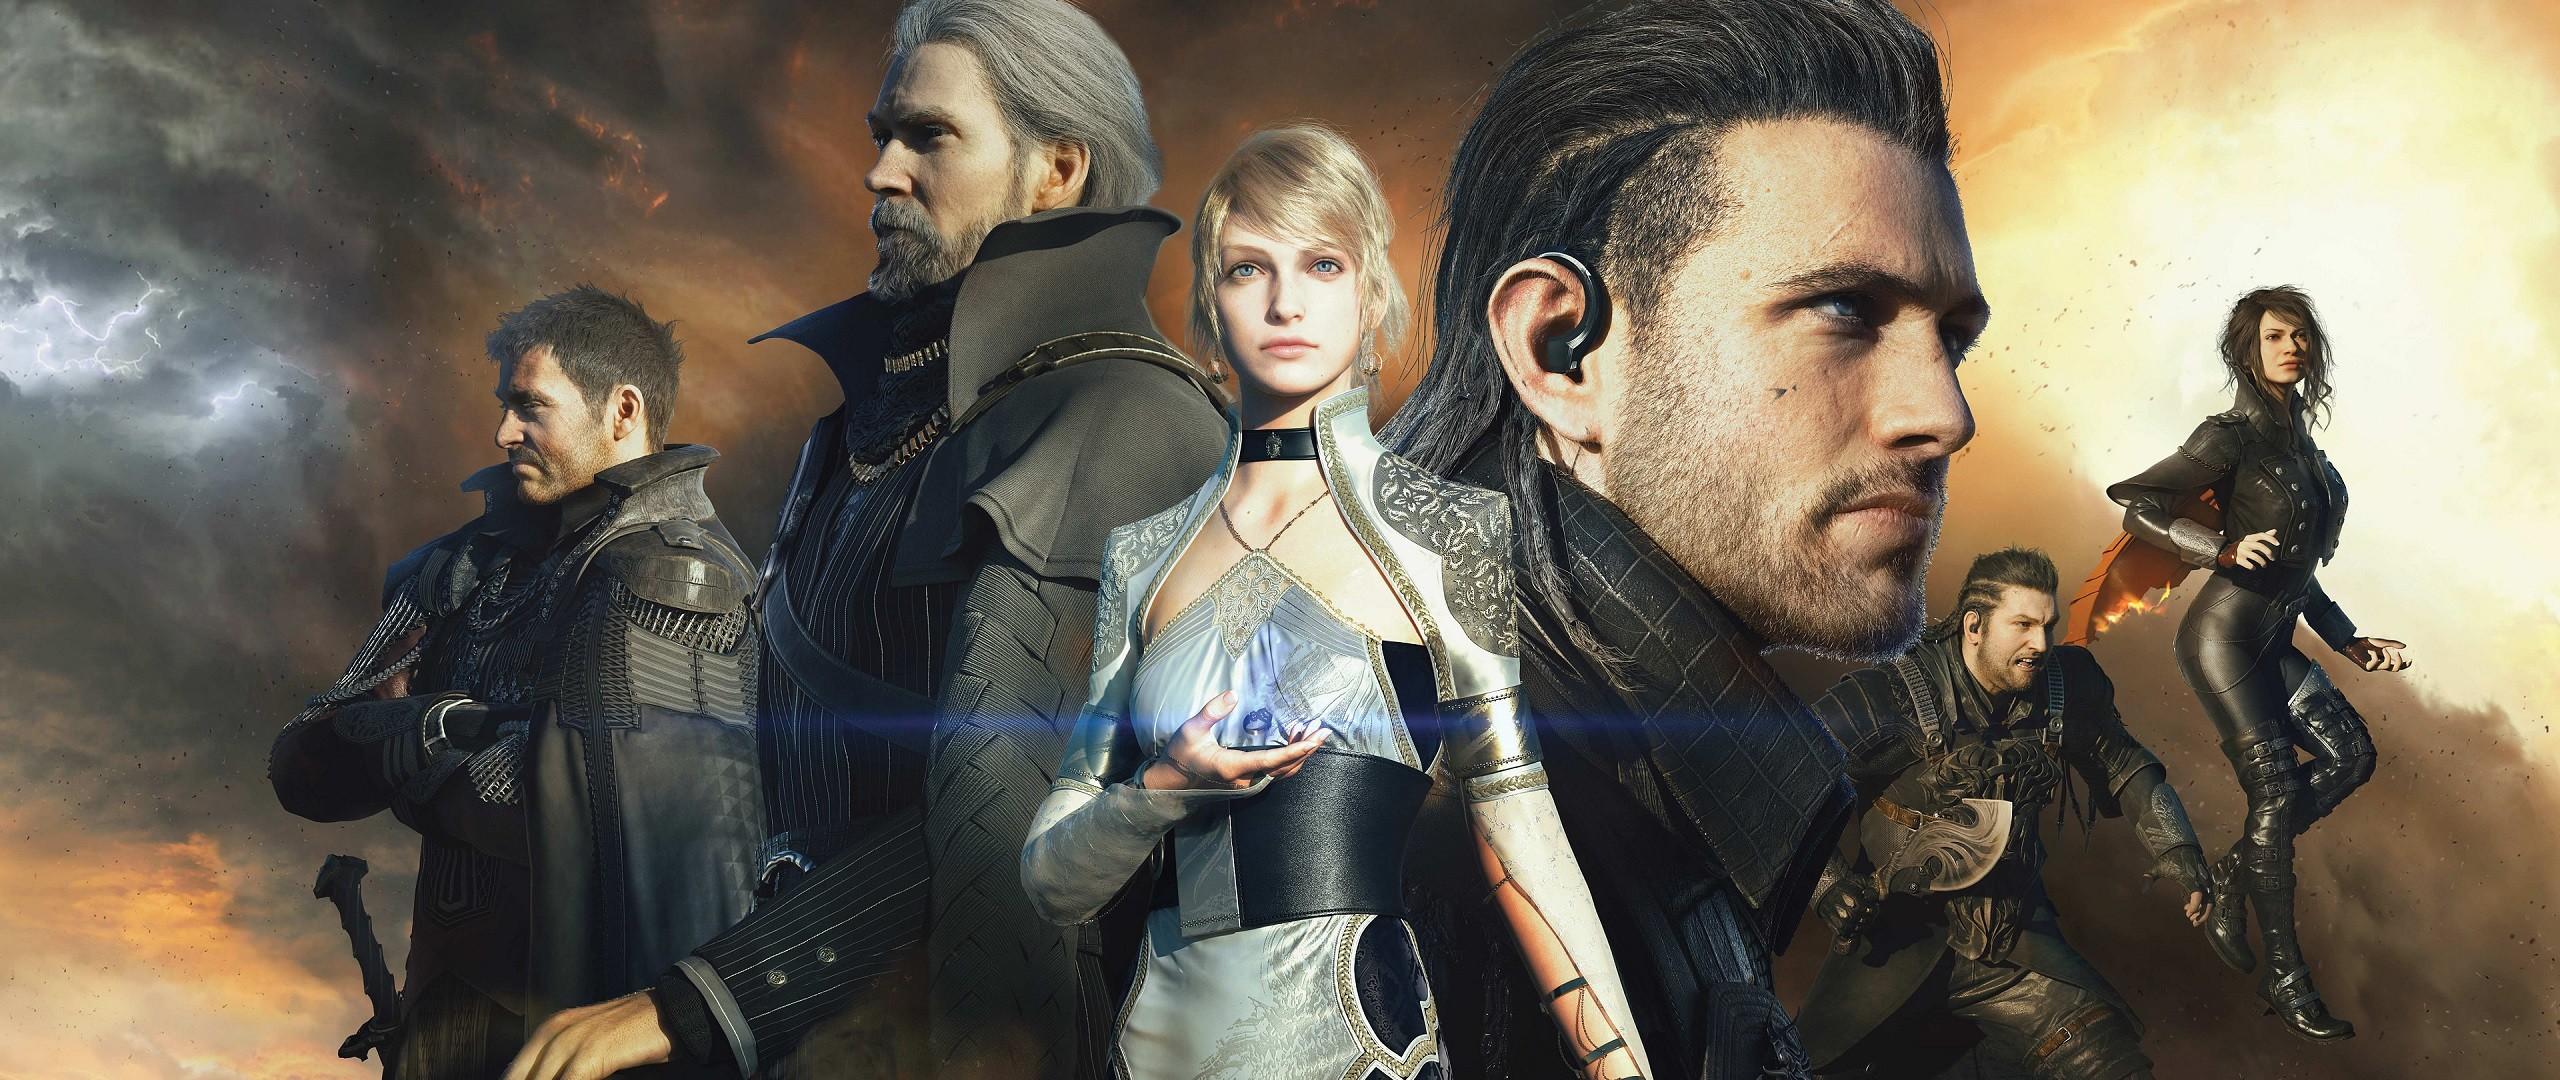 Movie – Kingsglaive: Final Fantasy XV Final Fantasy Wallpaper